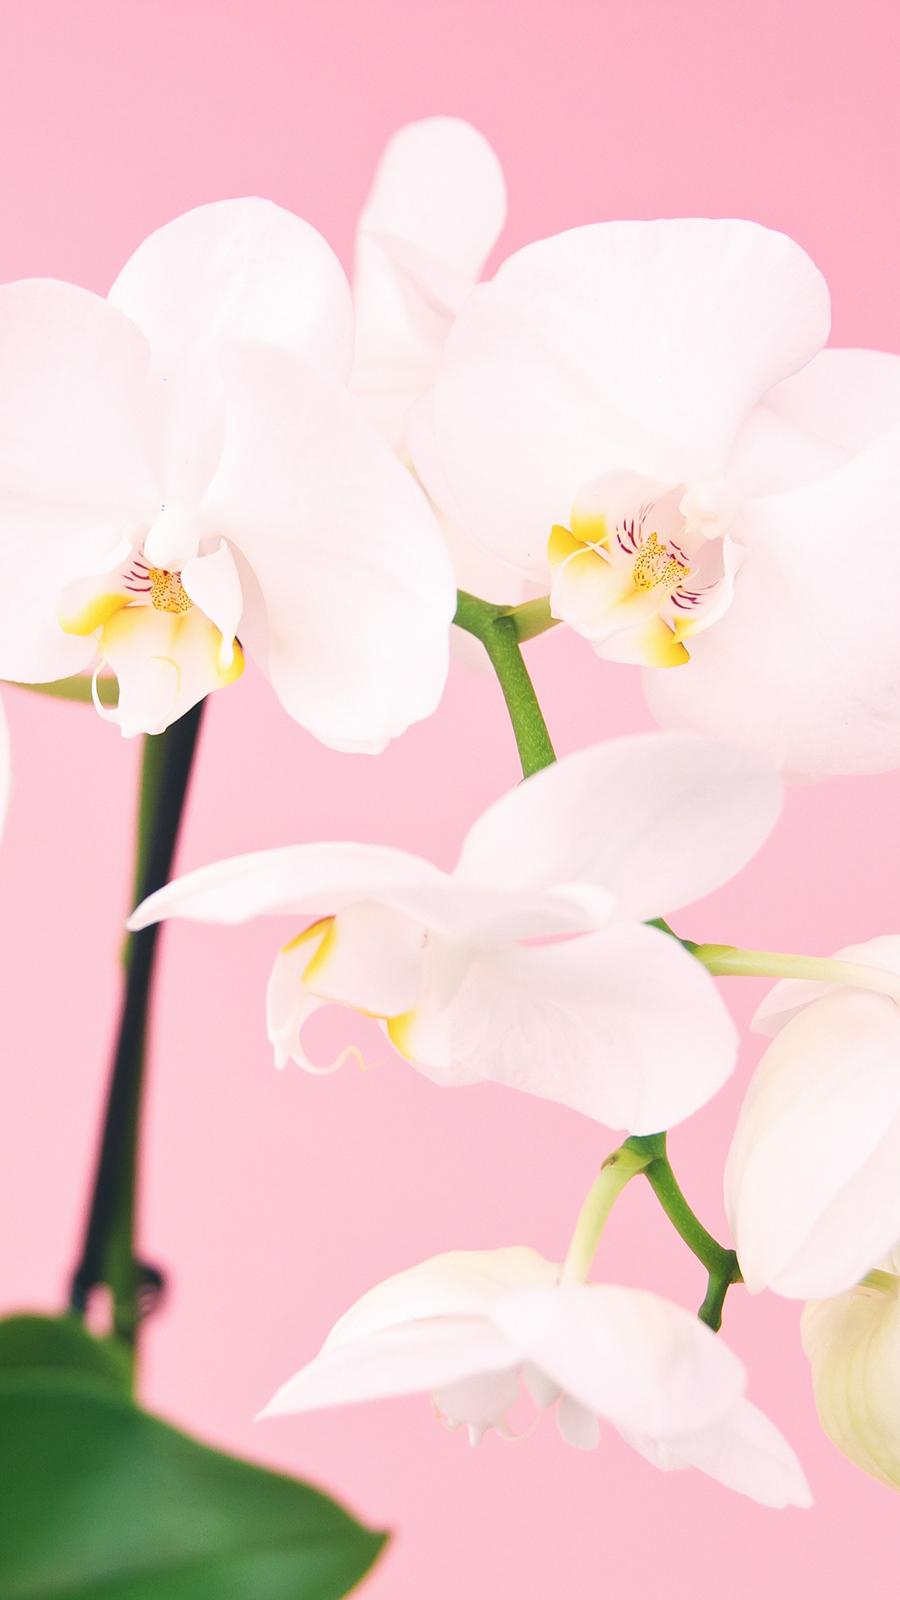 White Flower Wallpapers Free Download Phone & Desktop